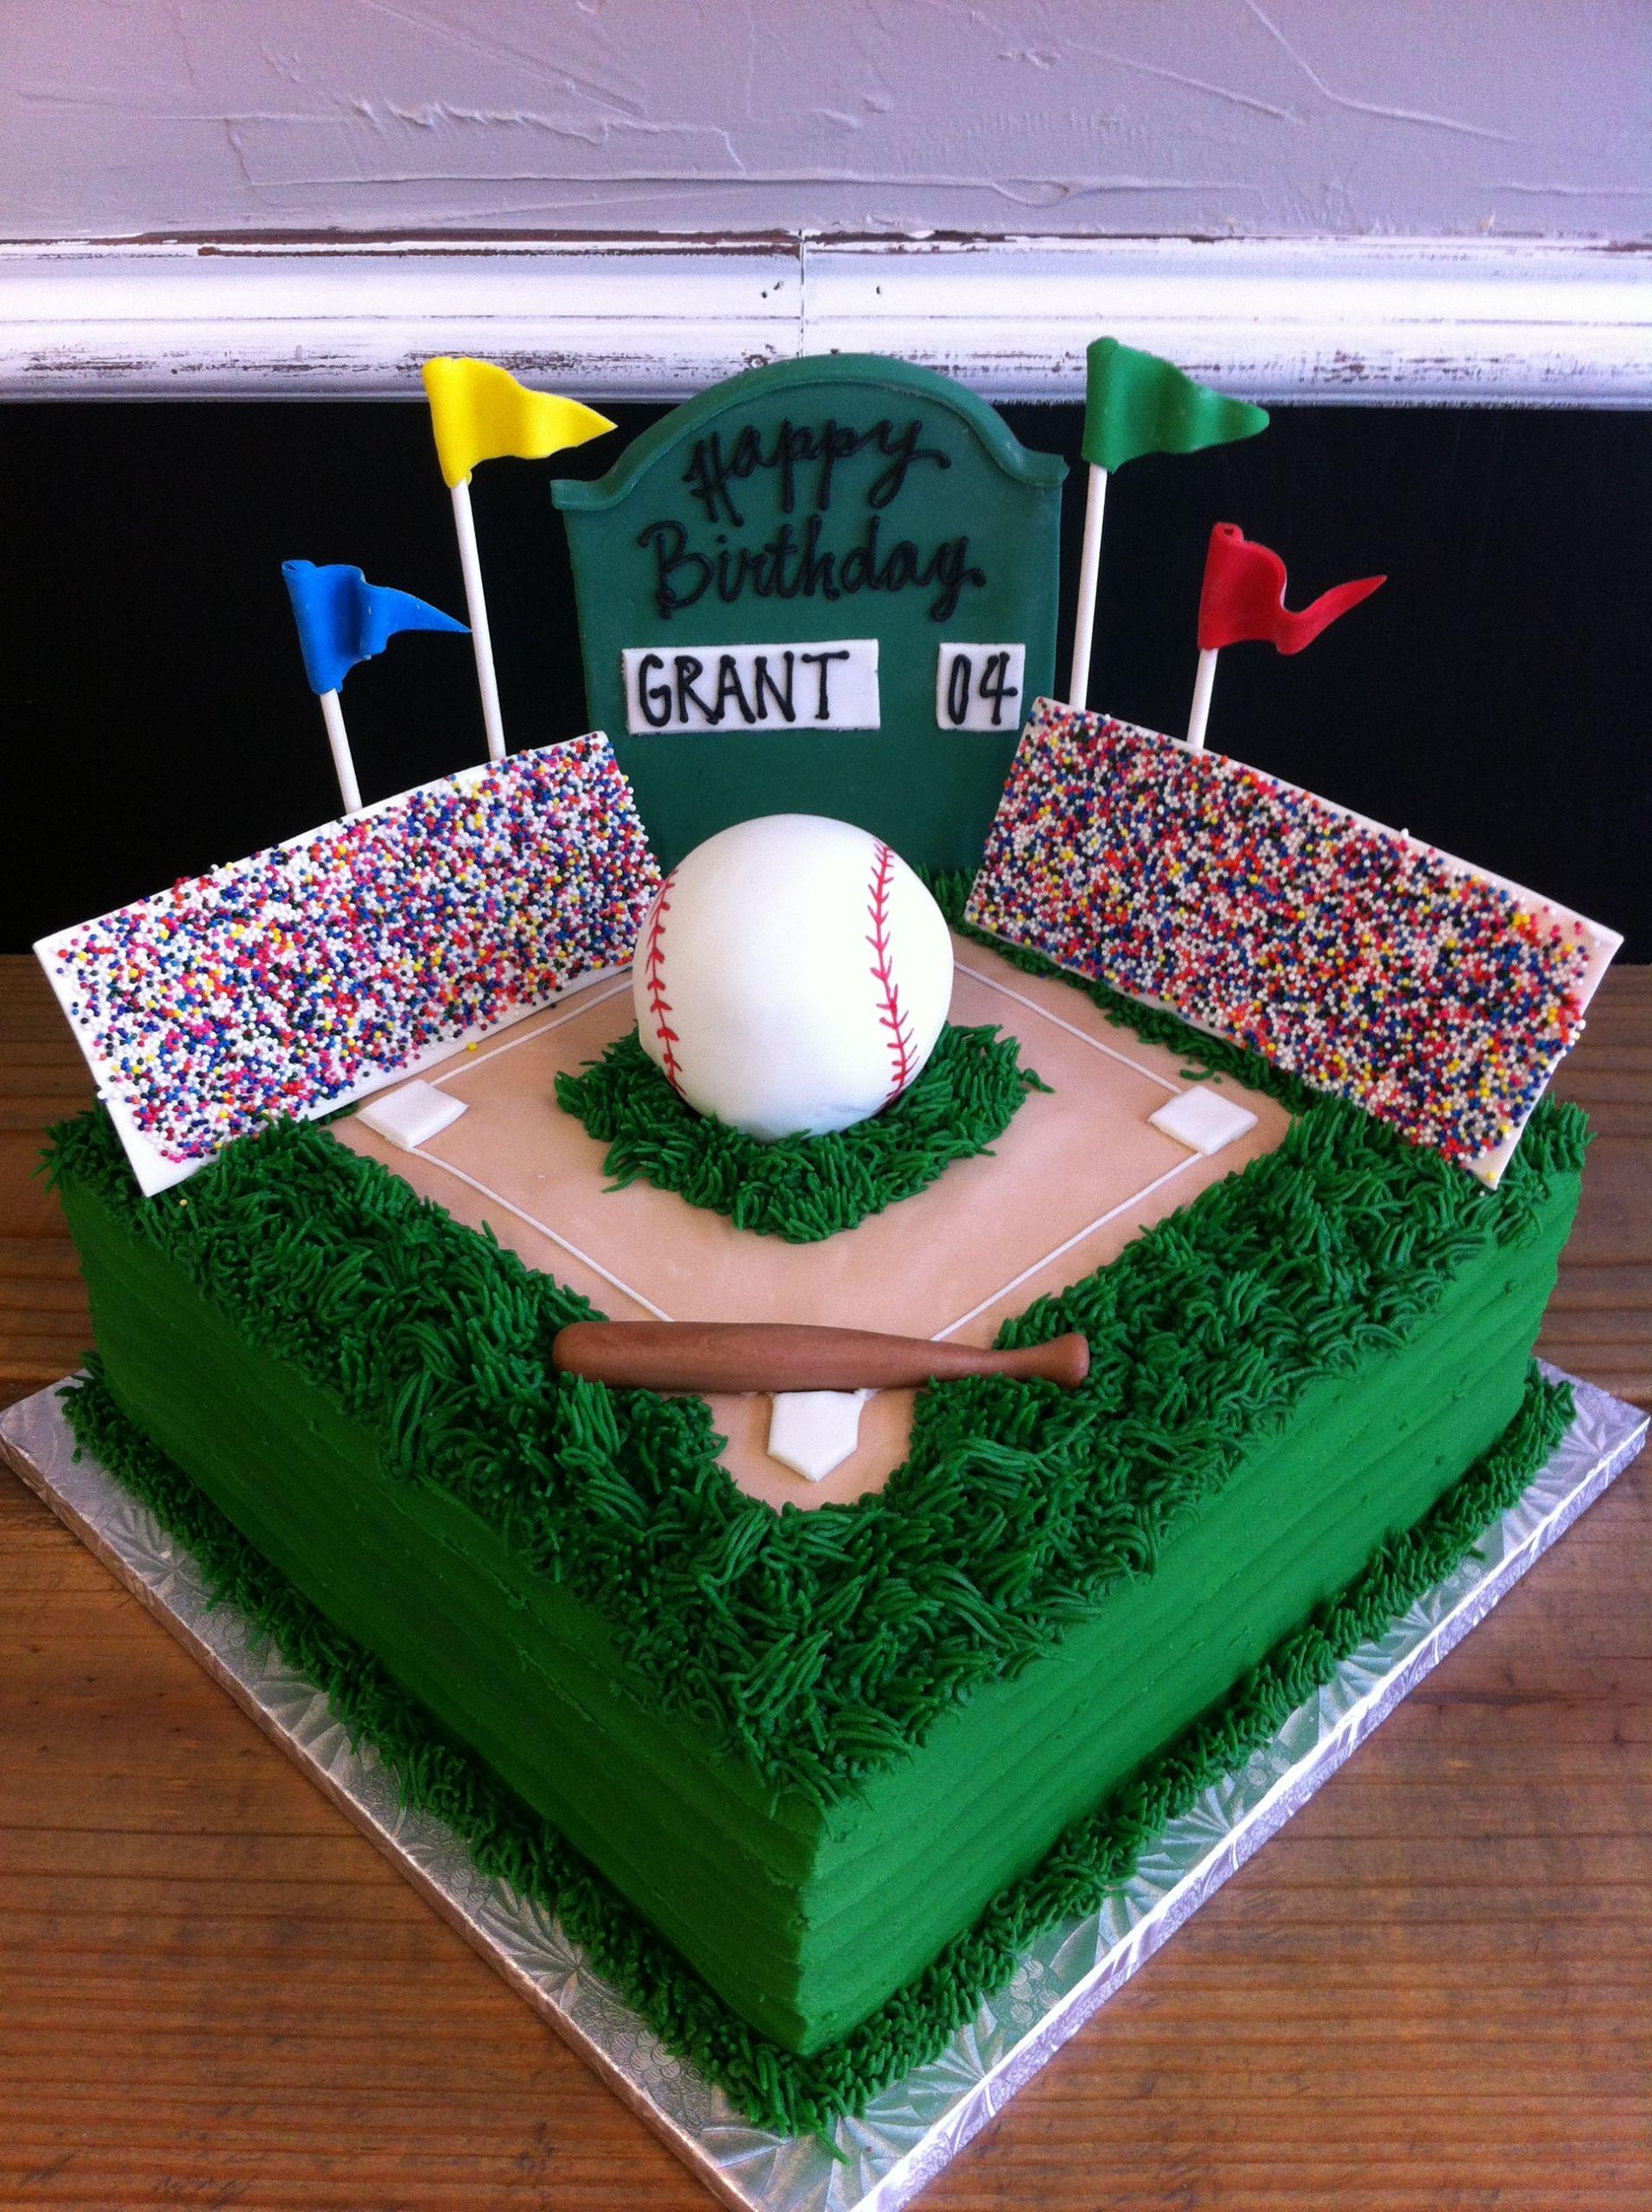 Baseball Birthday Cake  Party cakes in McKinney and Dallas Texas